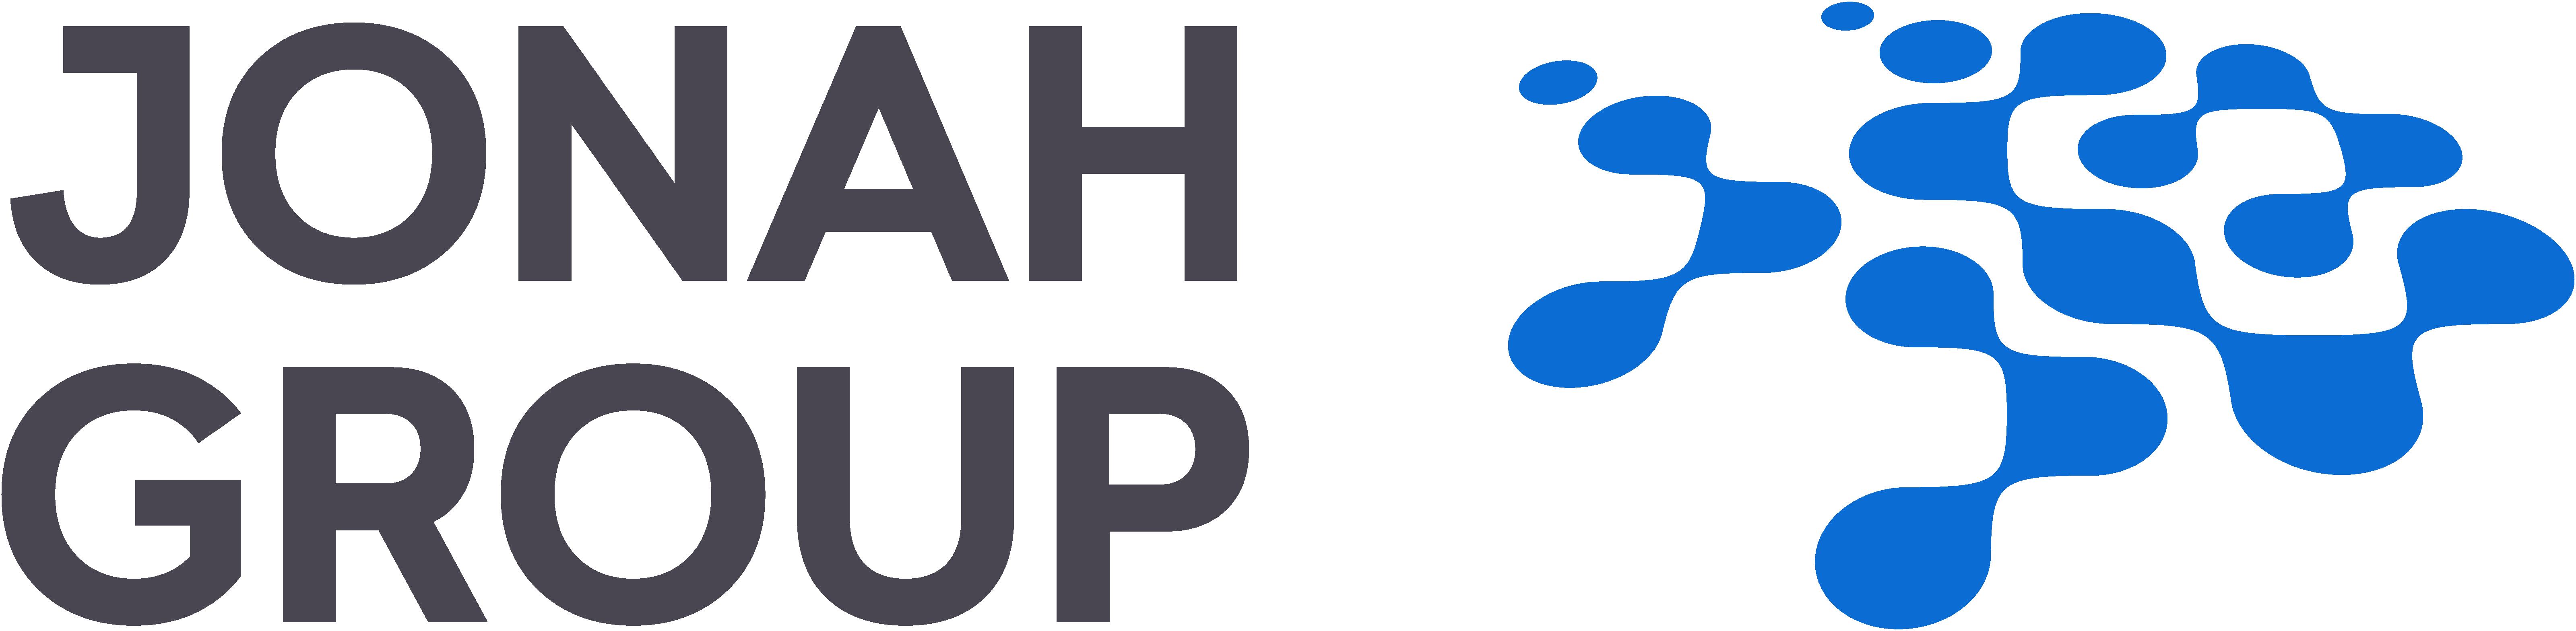 Jonah Group